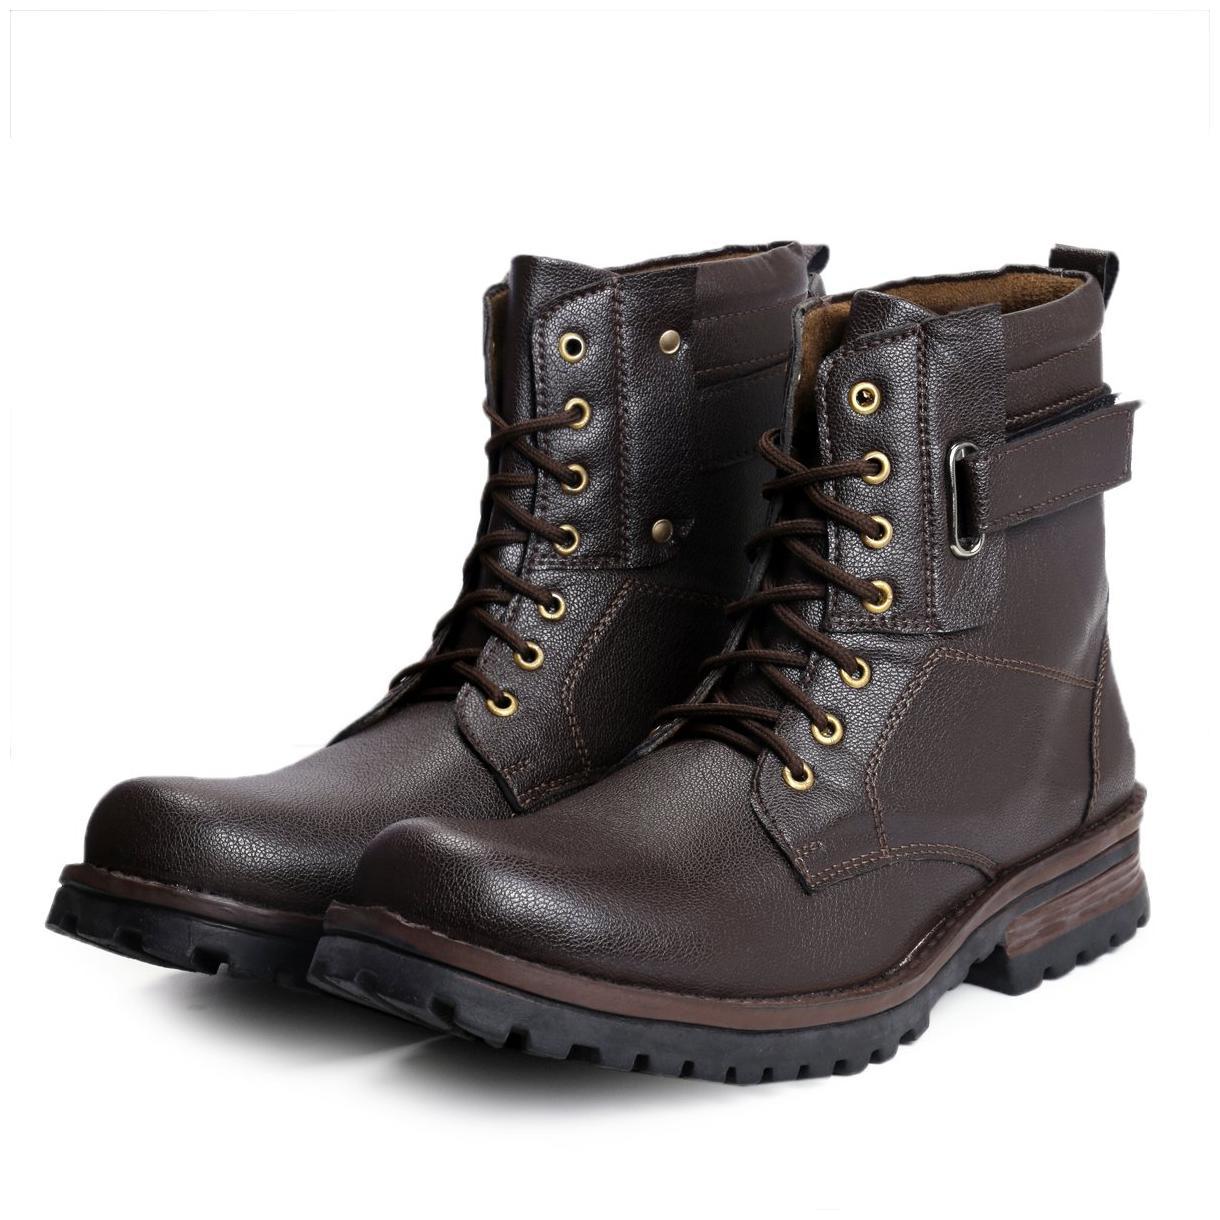 Clarks Womens Desert Boots Sale brieflook.co.uk